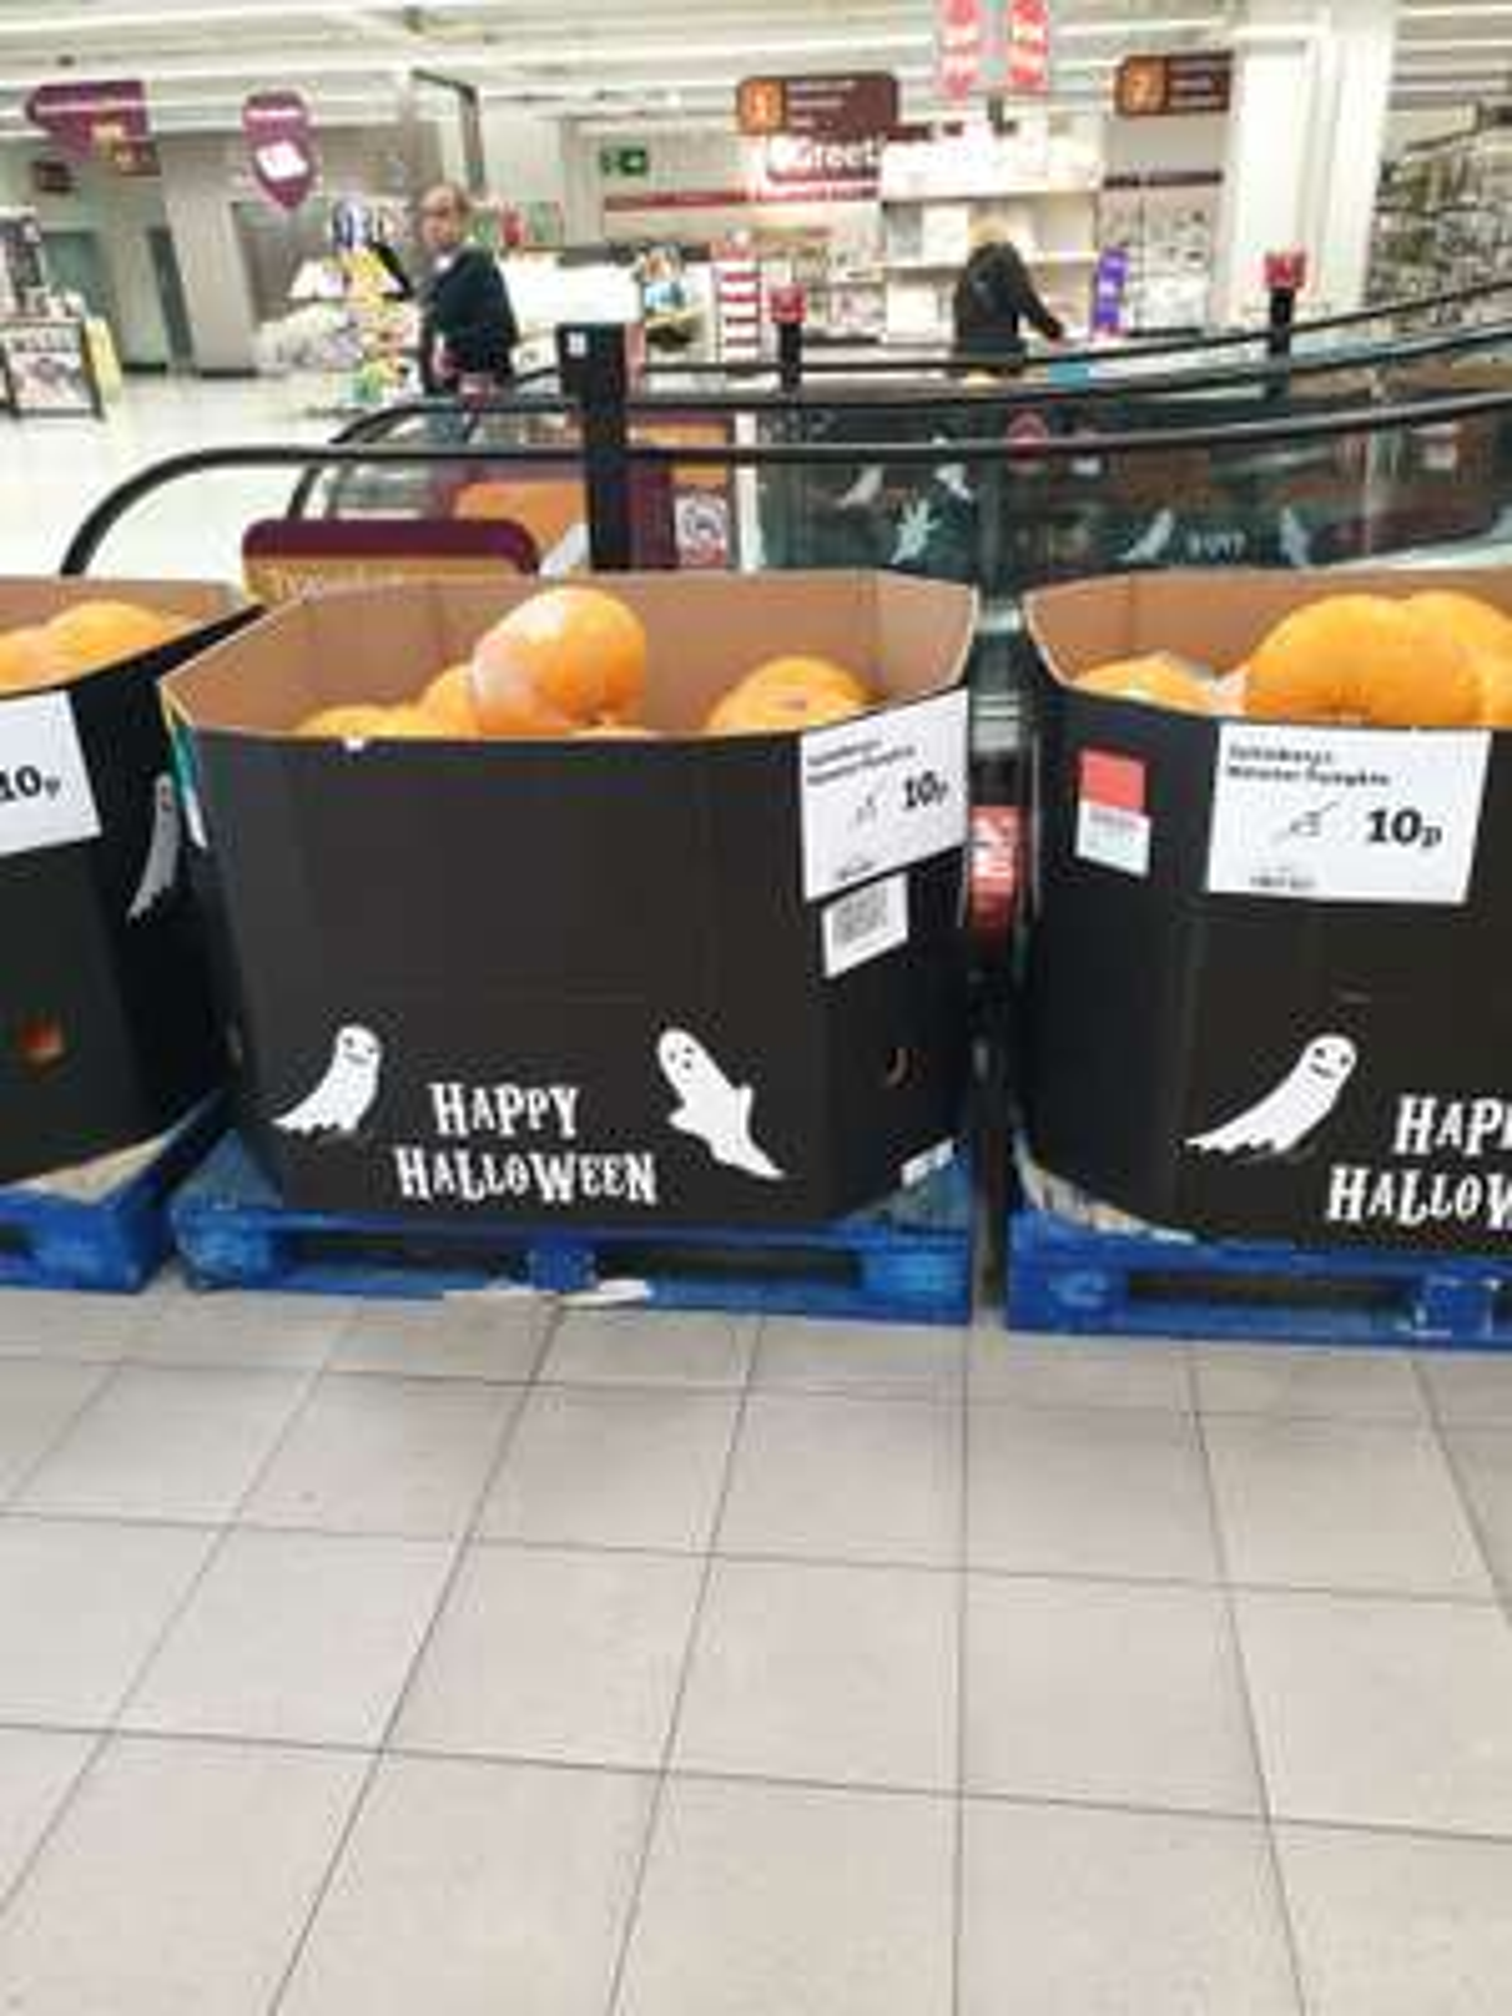 Pumpkins, 10p each at Sainsbury's Wandsworth, Fulham